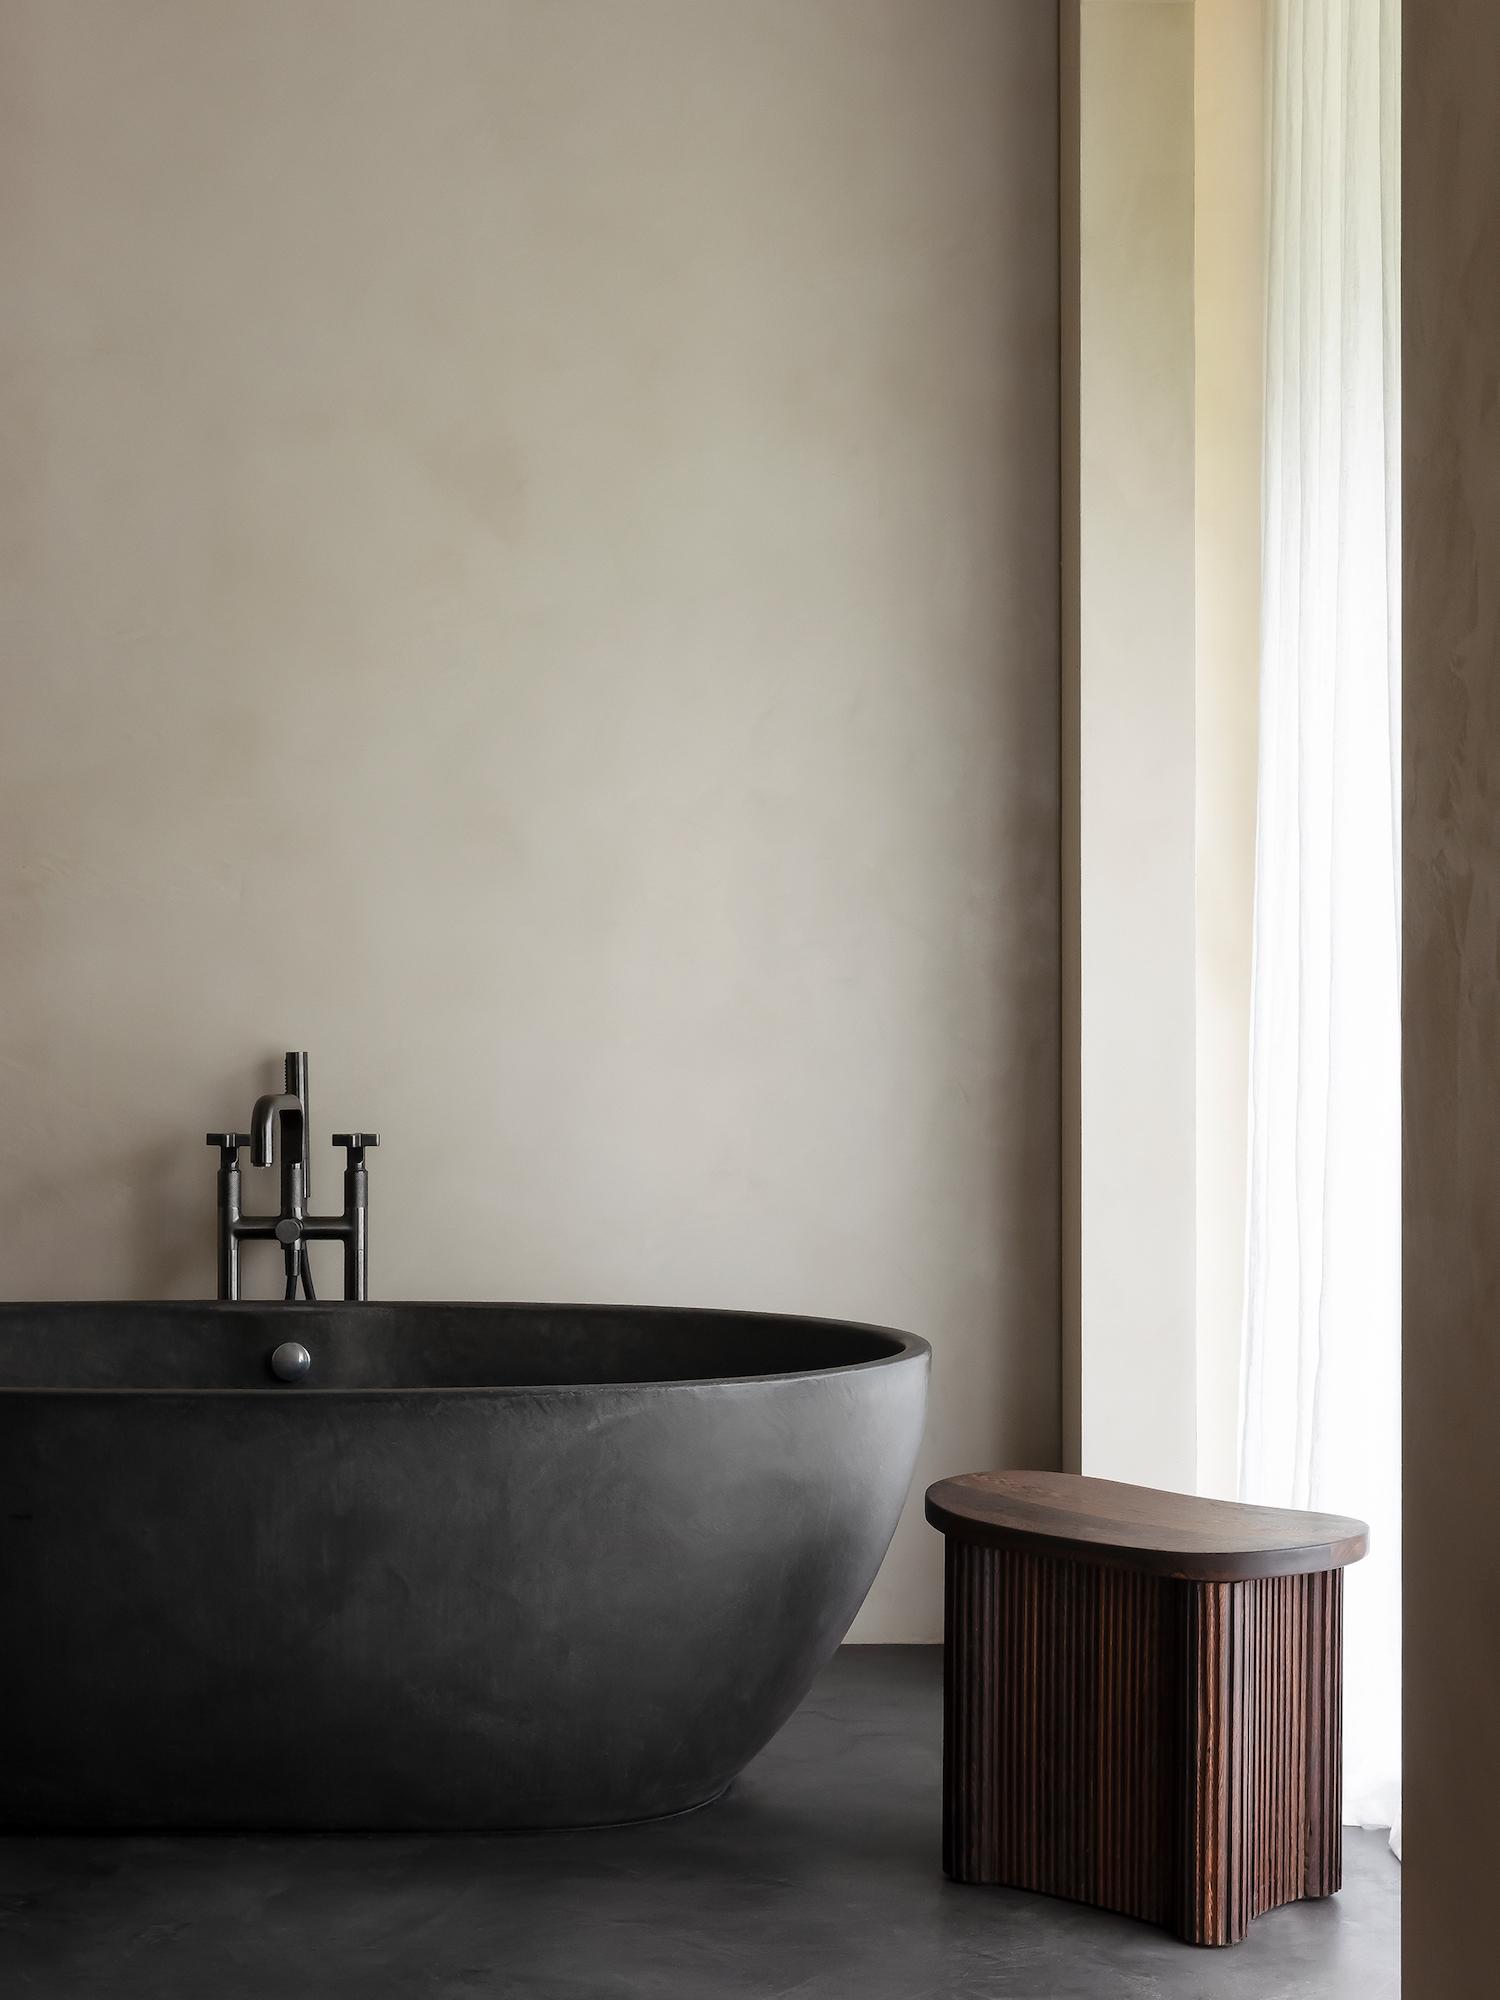 est living dries de malsche cascais residence belgian bathrooms 1